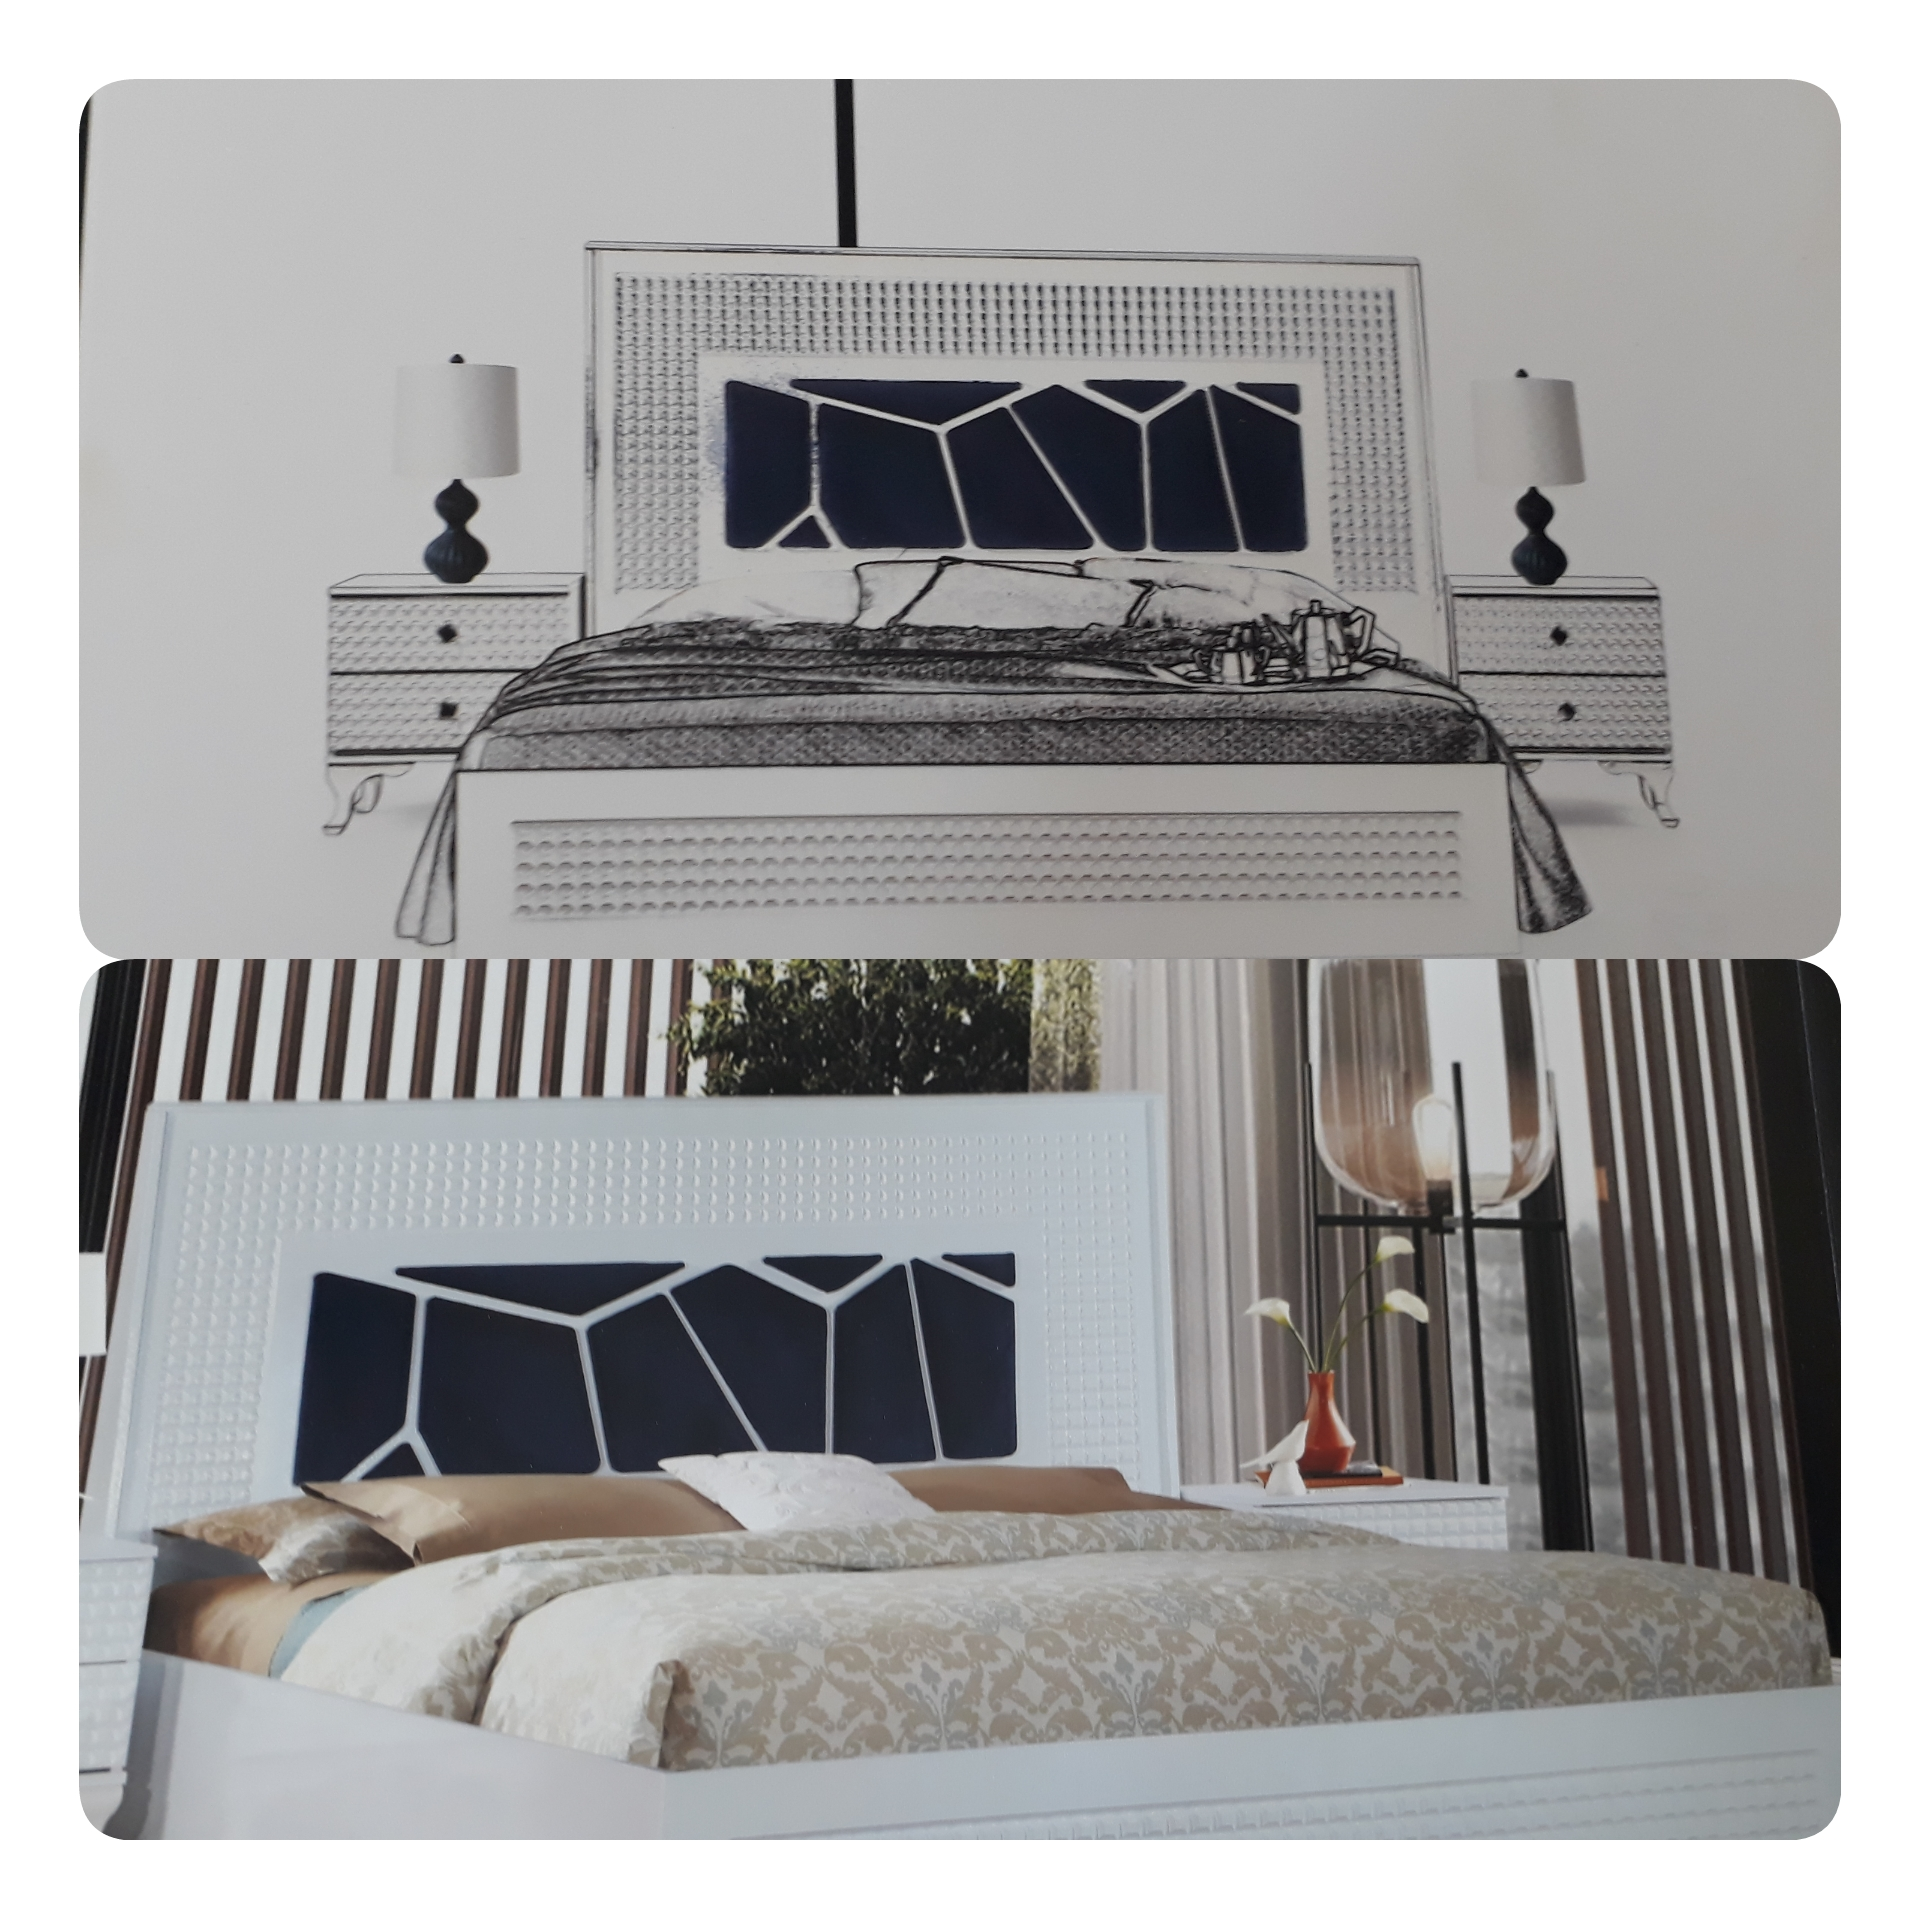 نمونه سرویس خواب وکیومی